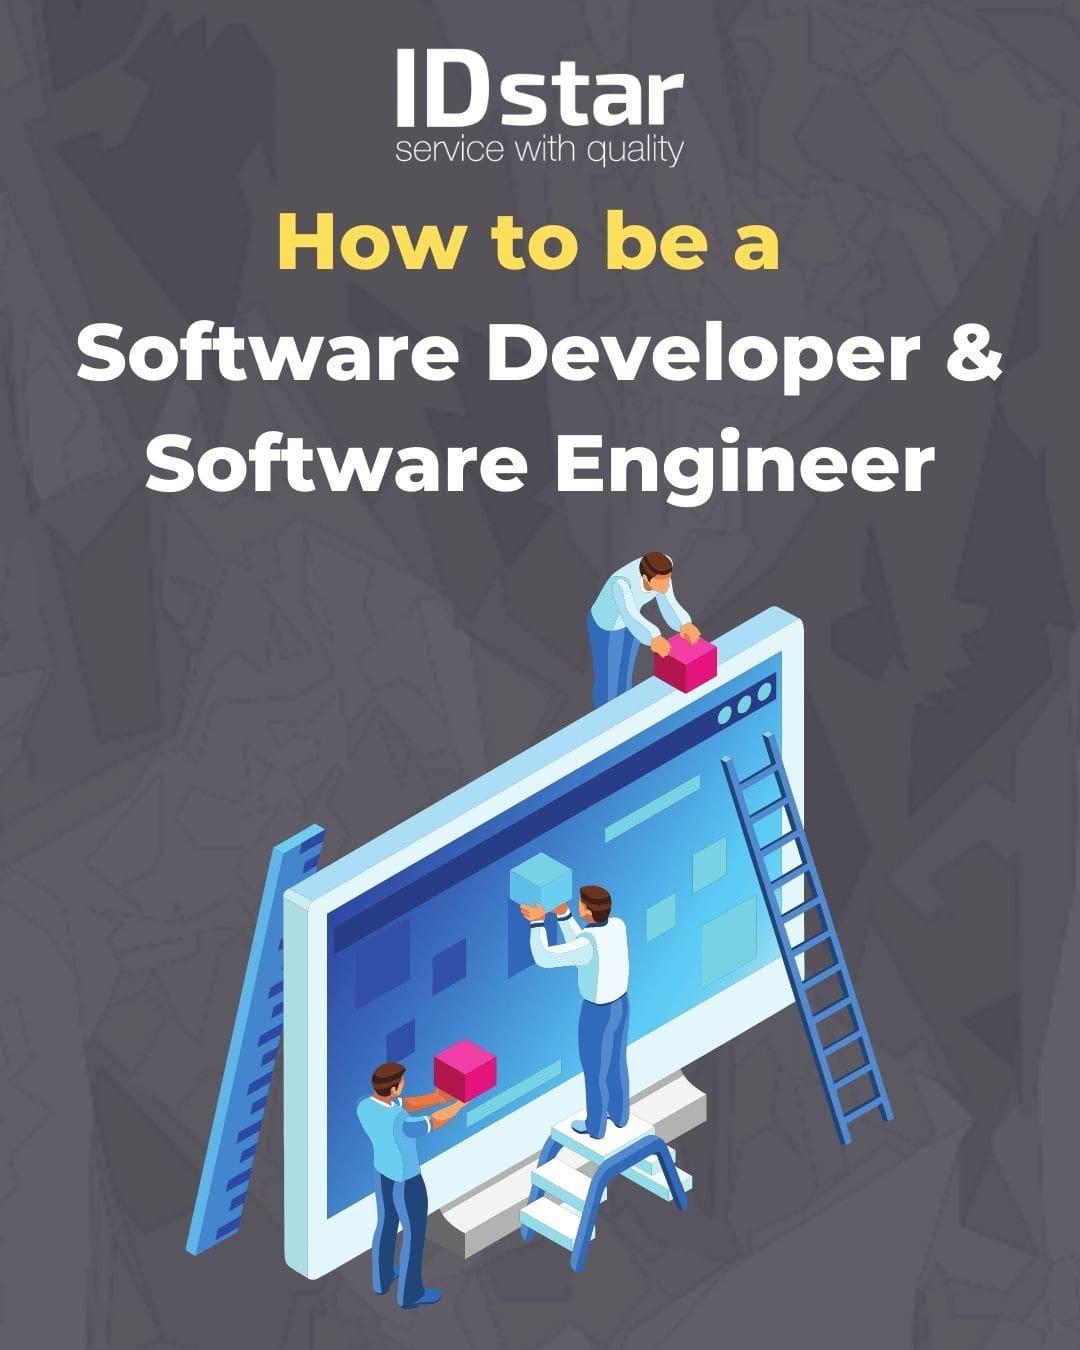 bedanya software developer dan software engineer